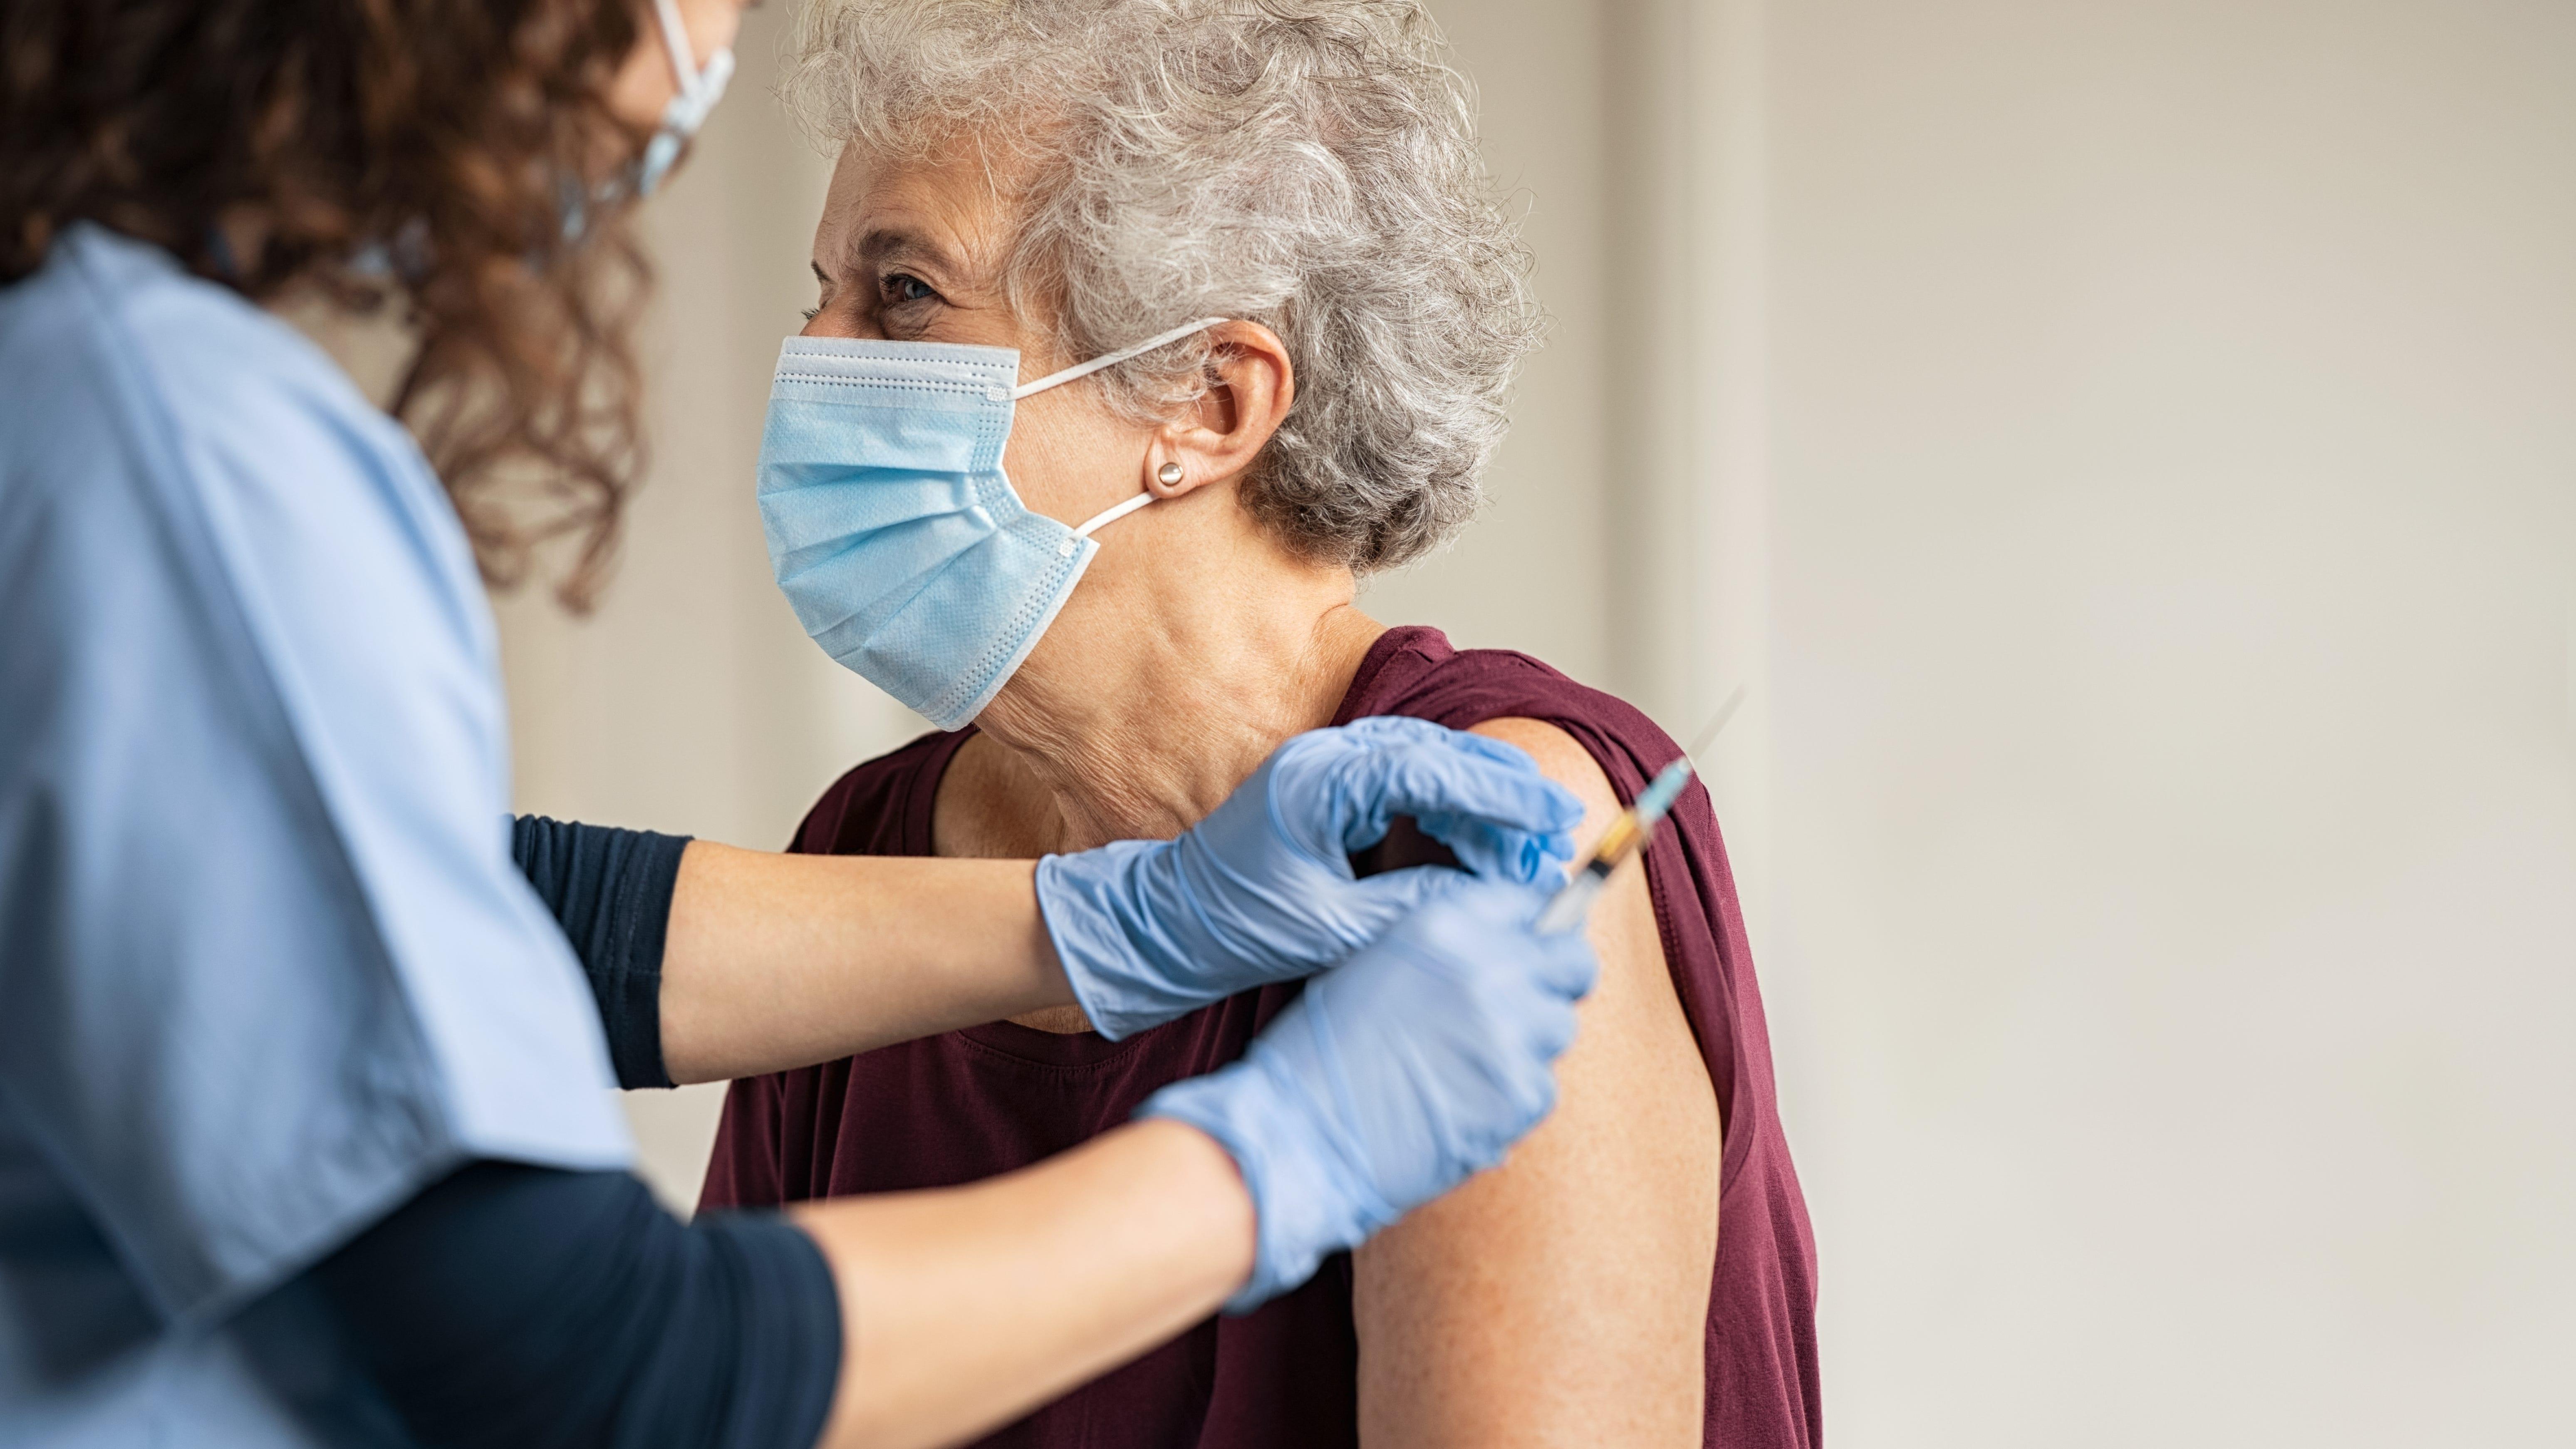 Infectious disease experts encourage flu vaccine to avoid concurrent disease, ICU overrun